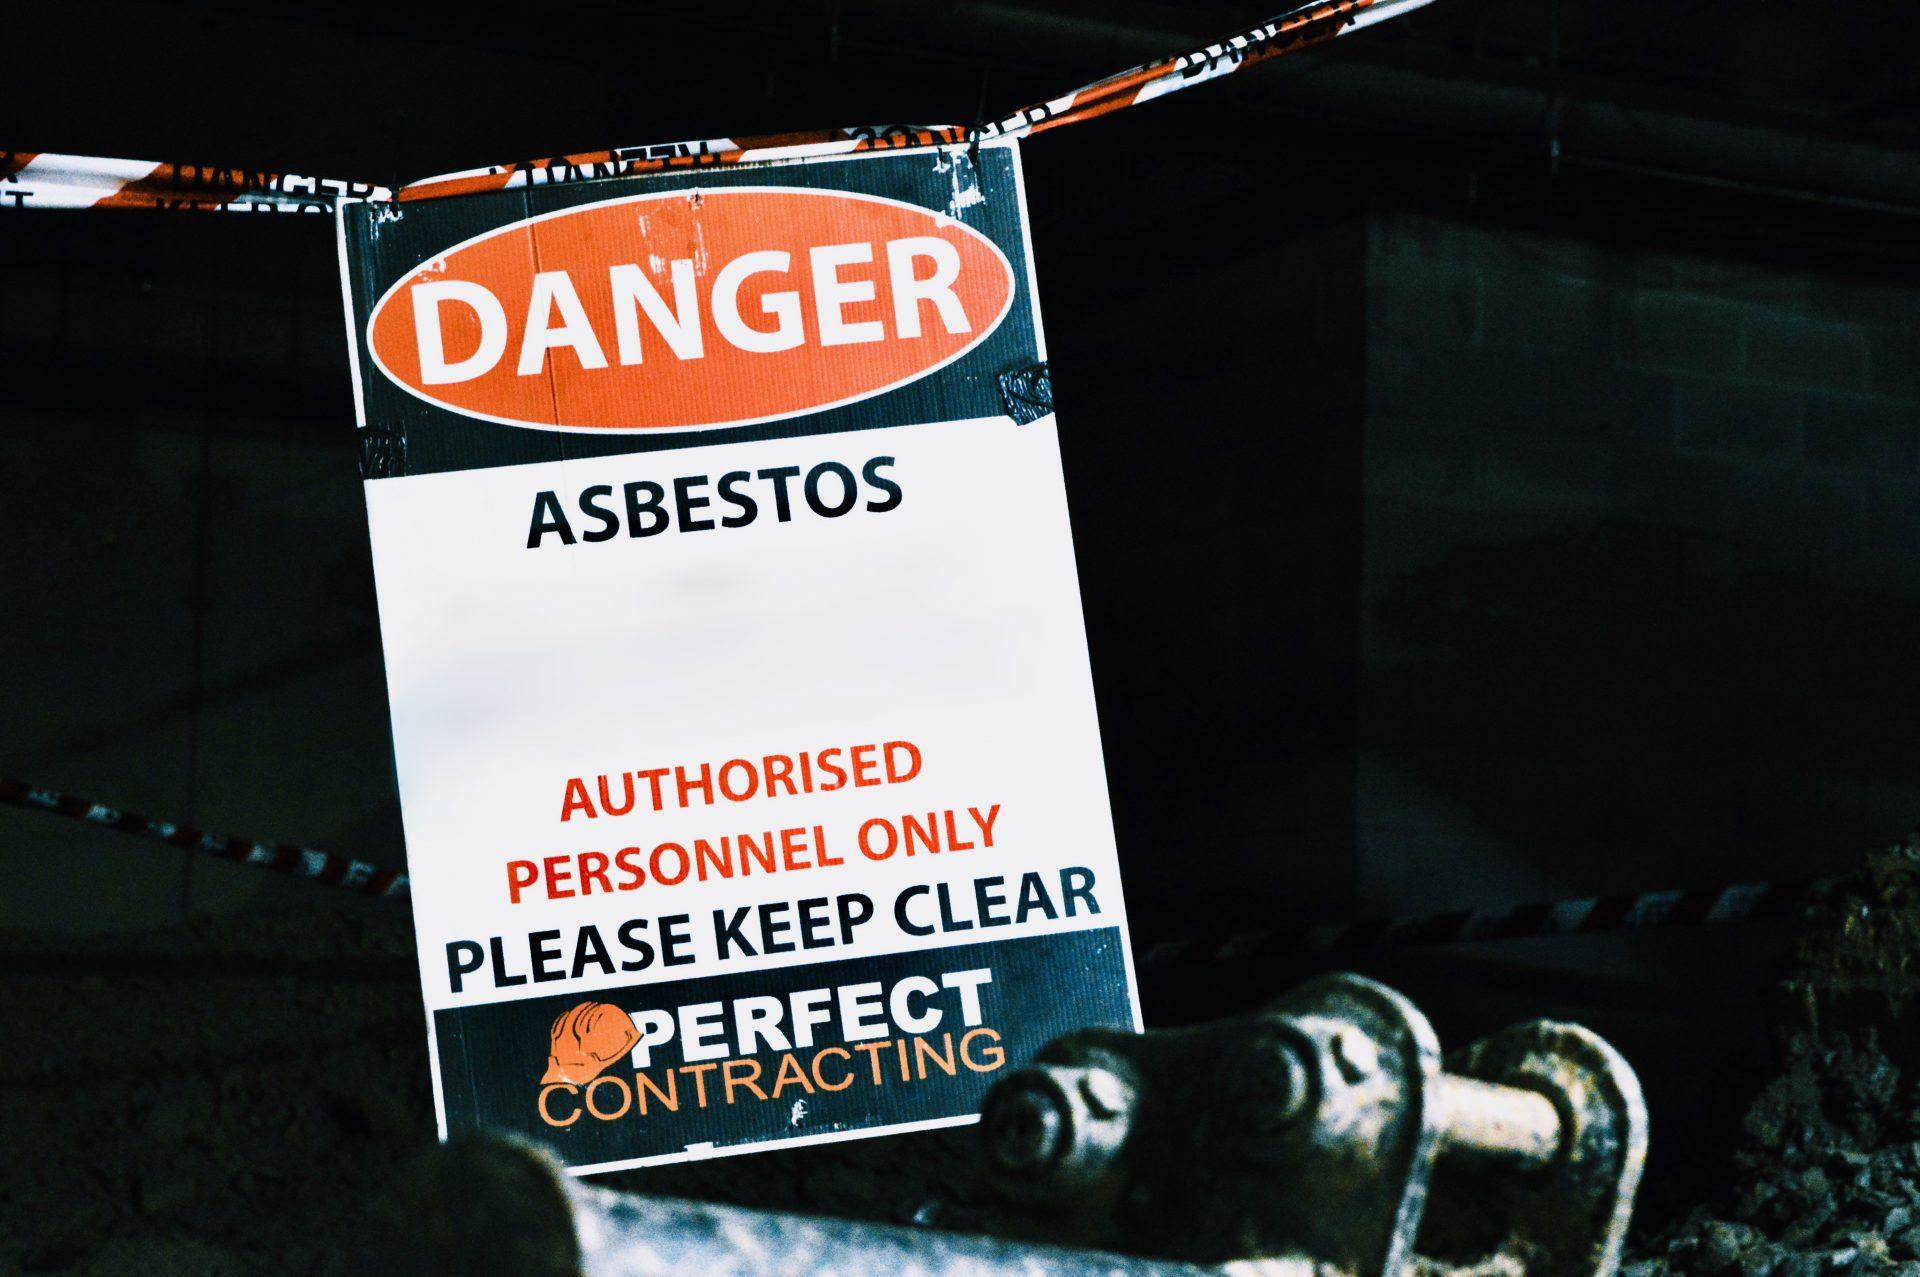 Asbestos - Perfect Contracting